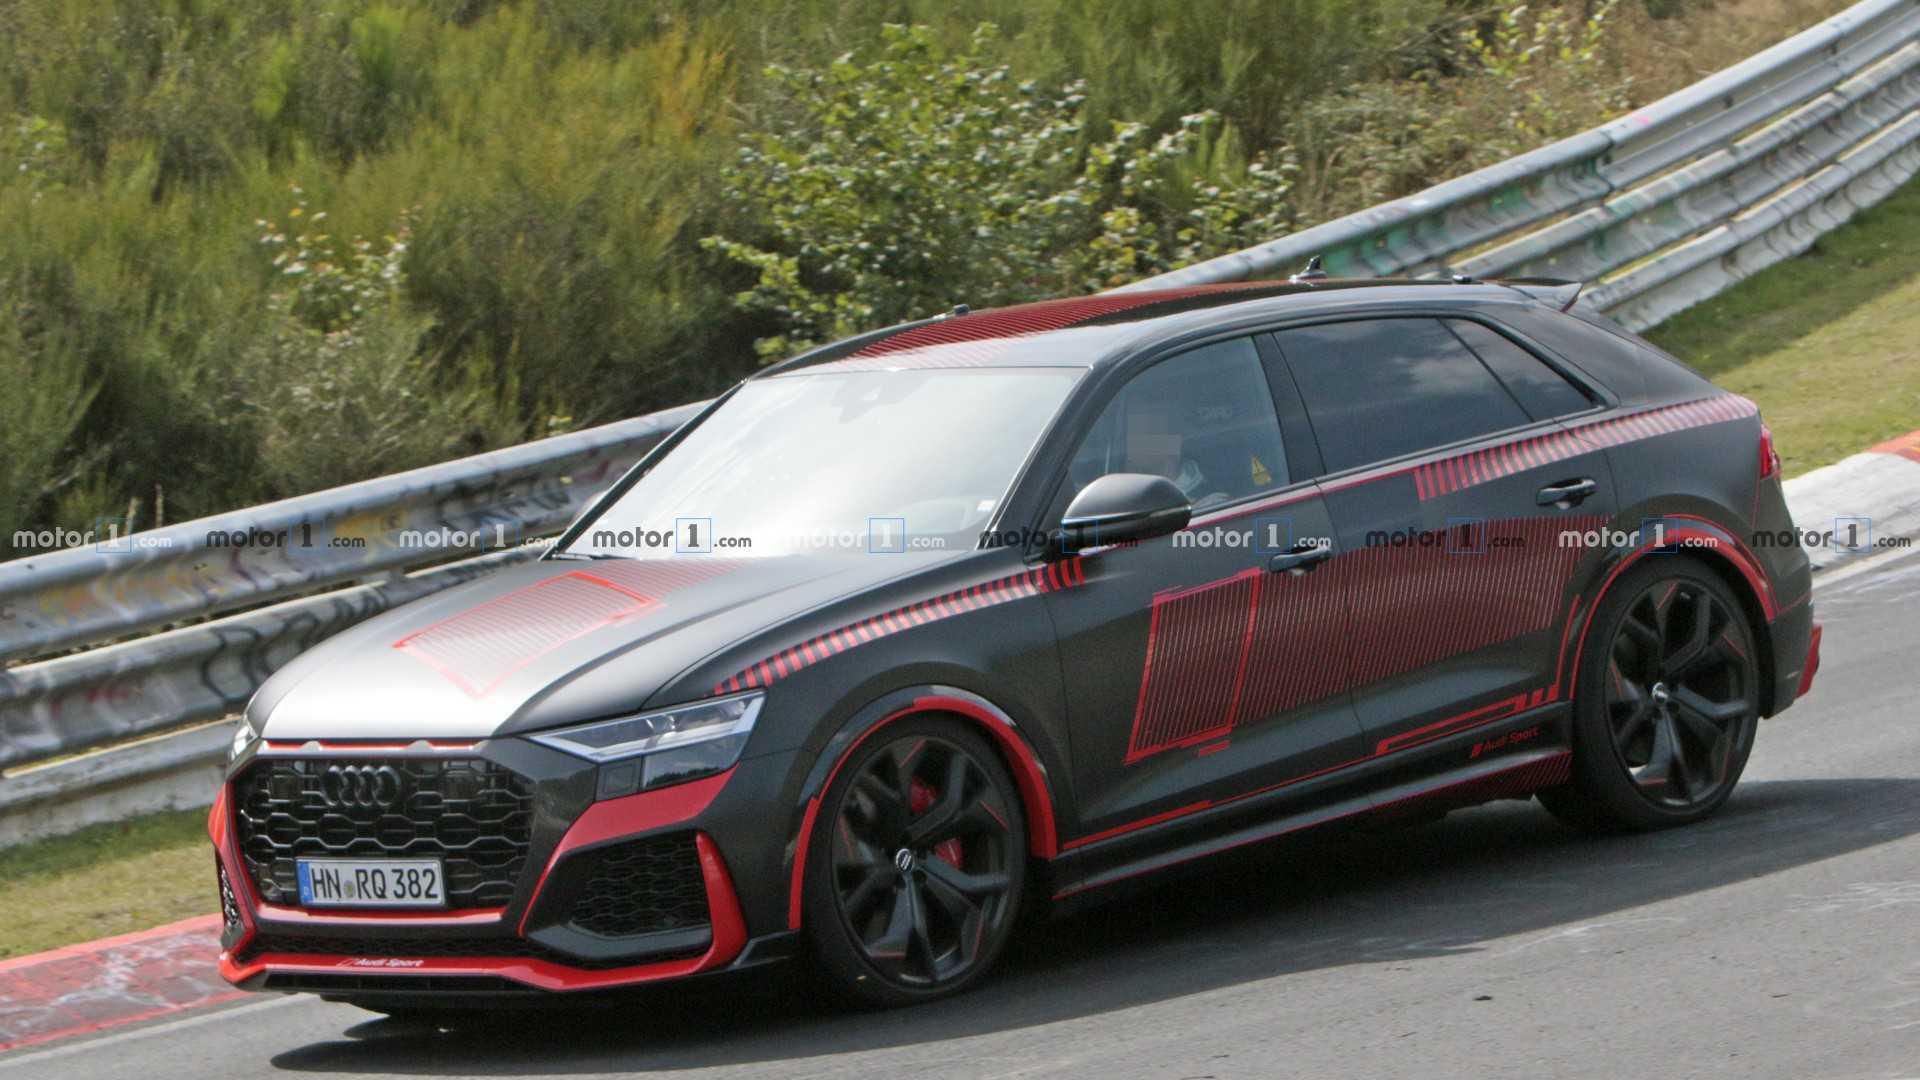 2020 Audi Q8: News, SQ8, RS Q8, Price >> Audi Rs Q8 Rendering Predicts The Inevitable